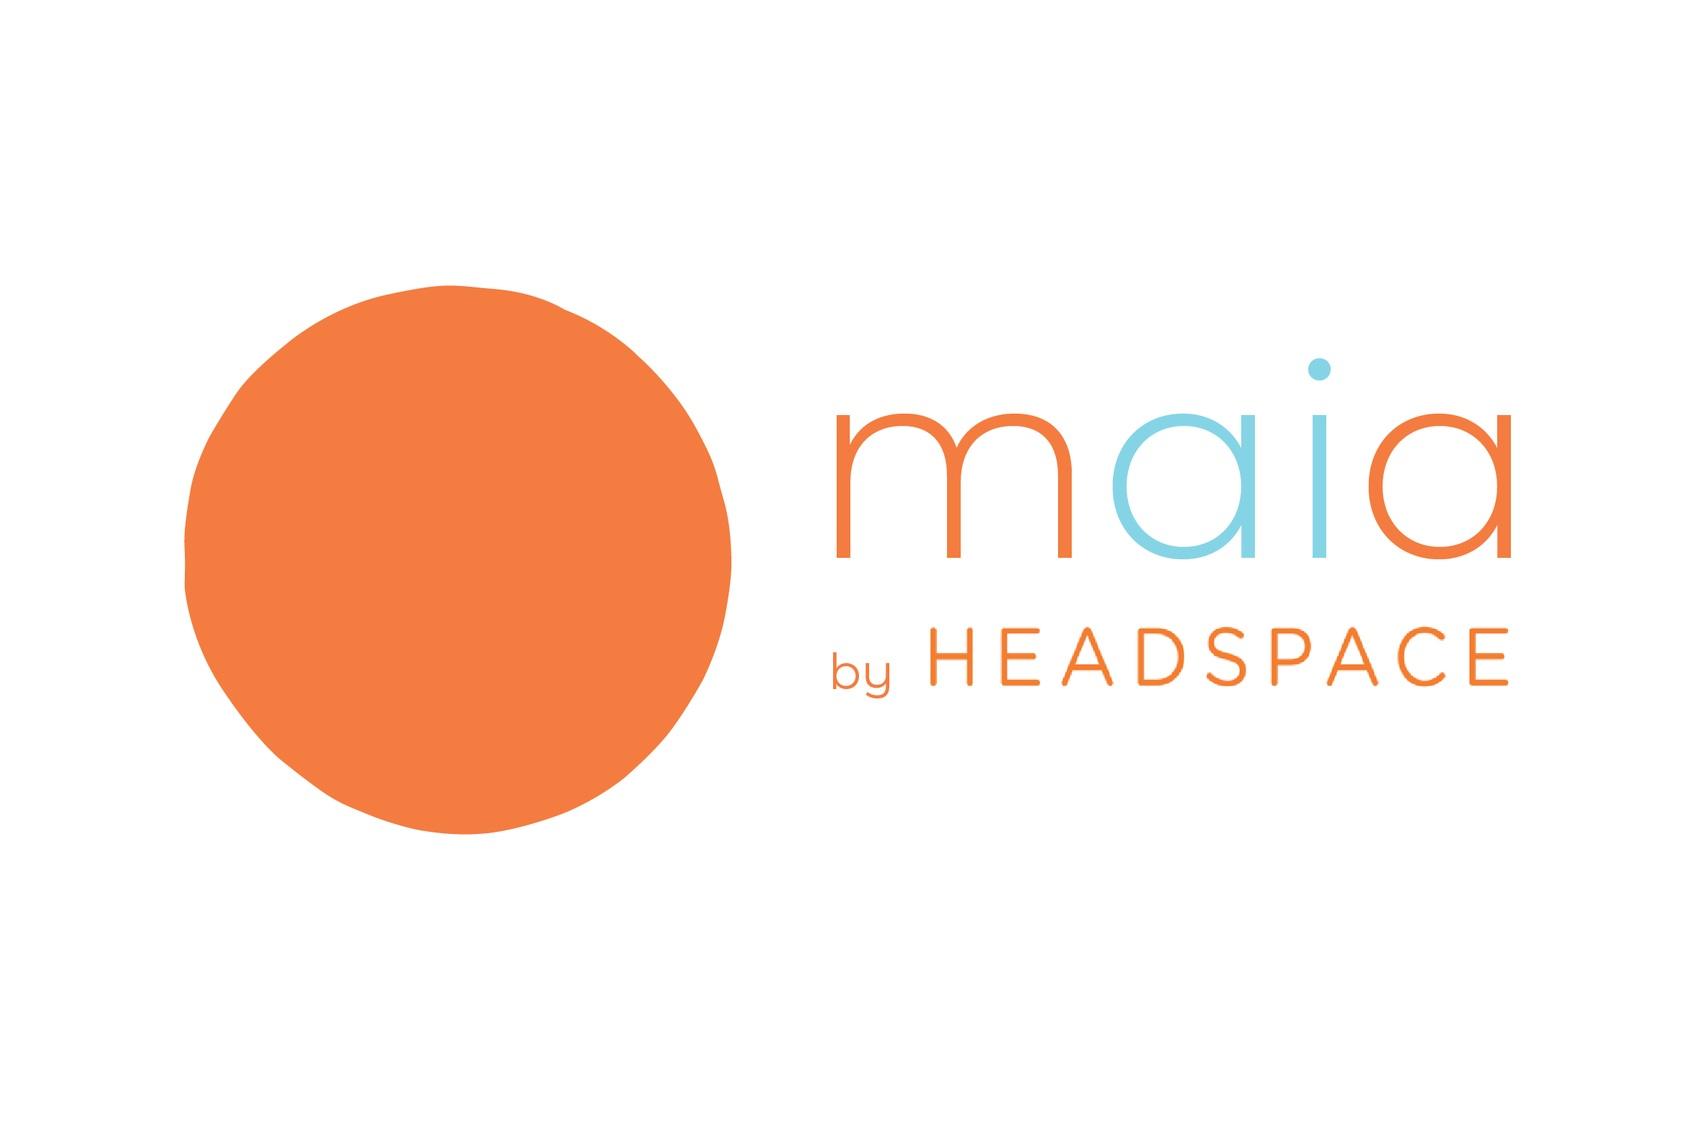 maia+headspace+logo+horizontal-01.jpg